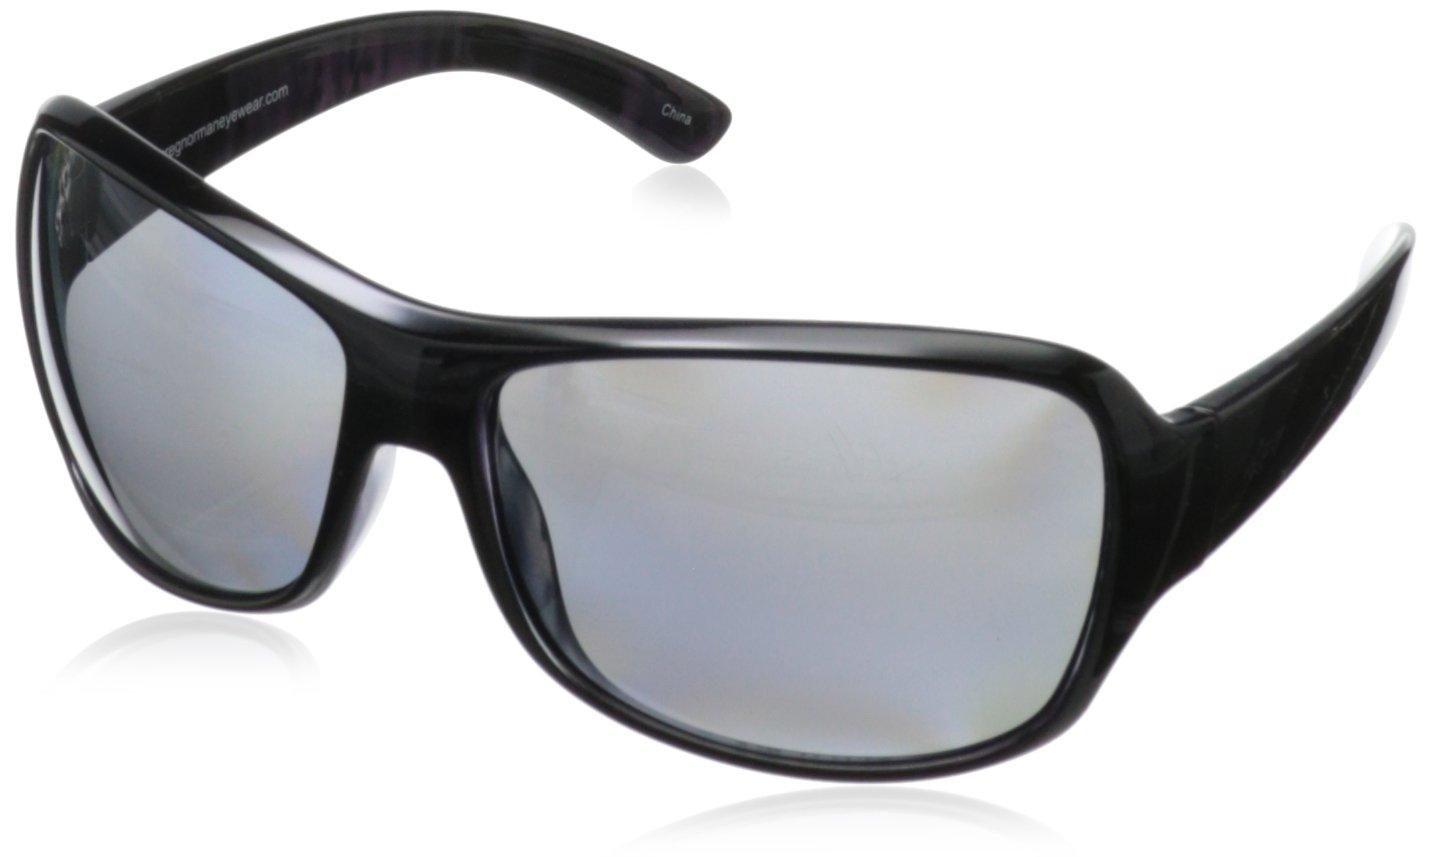 Greg Norman G4216 Polarized Sport Oversize Soft Square Glare Control Polarized Sunglasses,Shiny Black & Purple, 63 mm